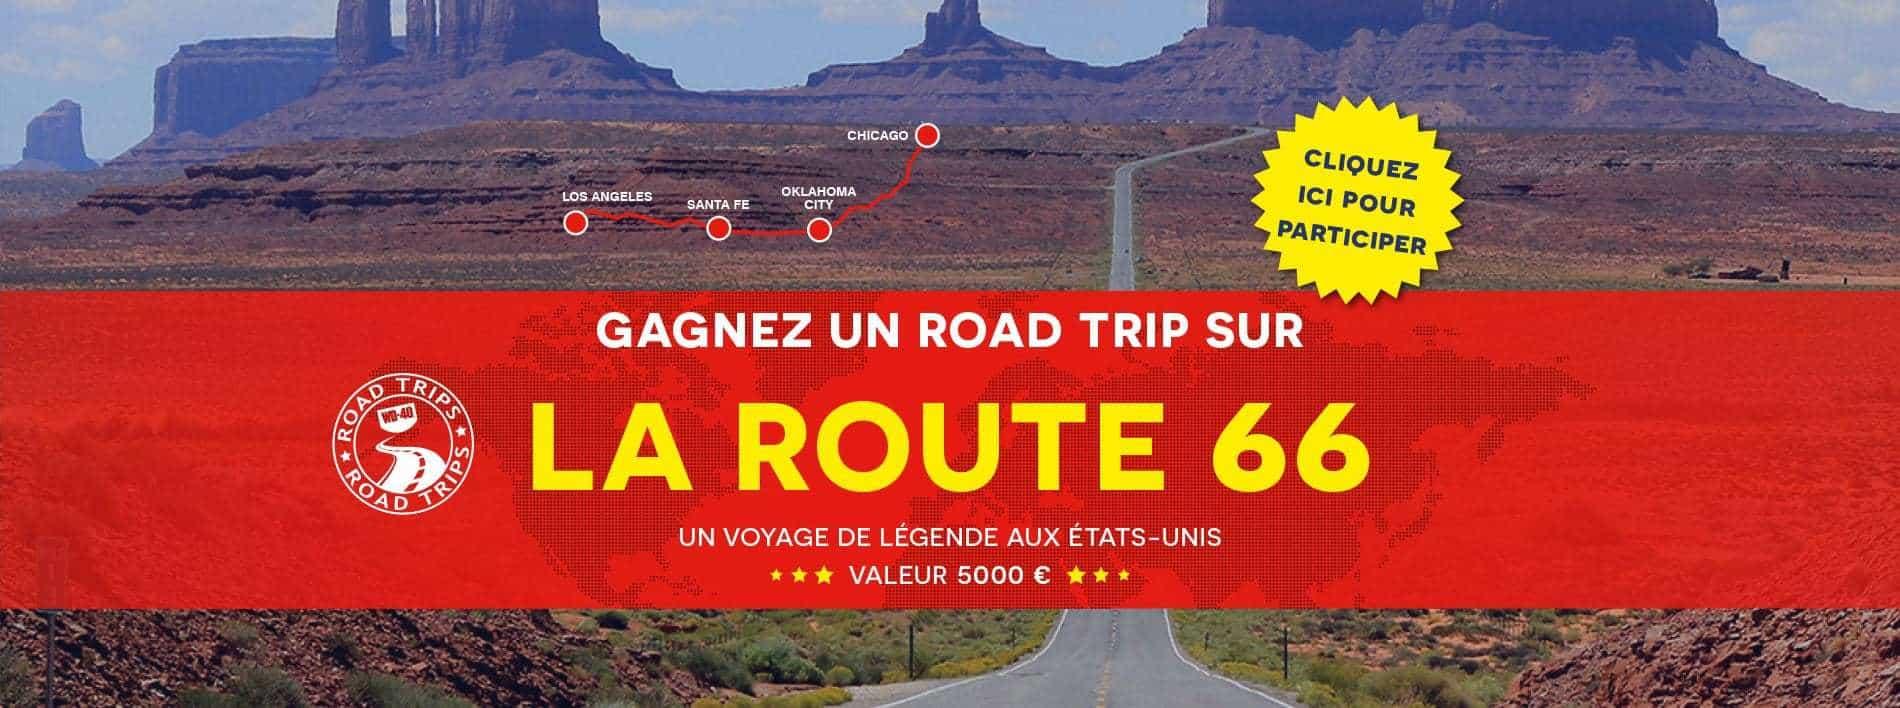 Gagnez Road Trip Route 66